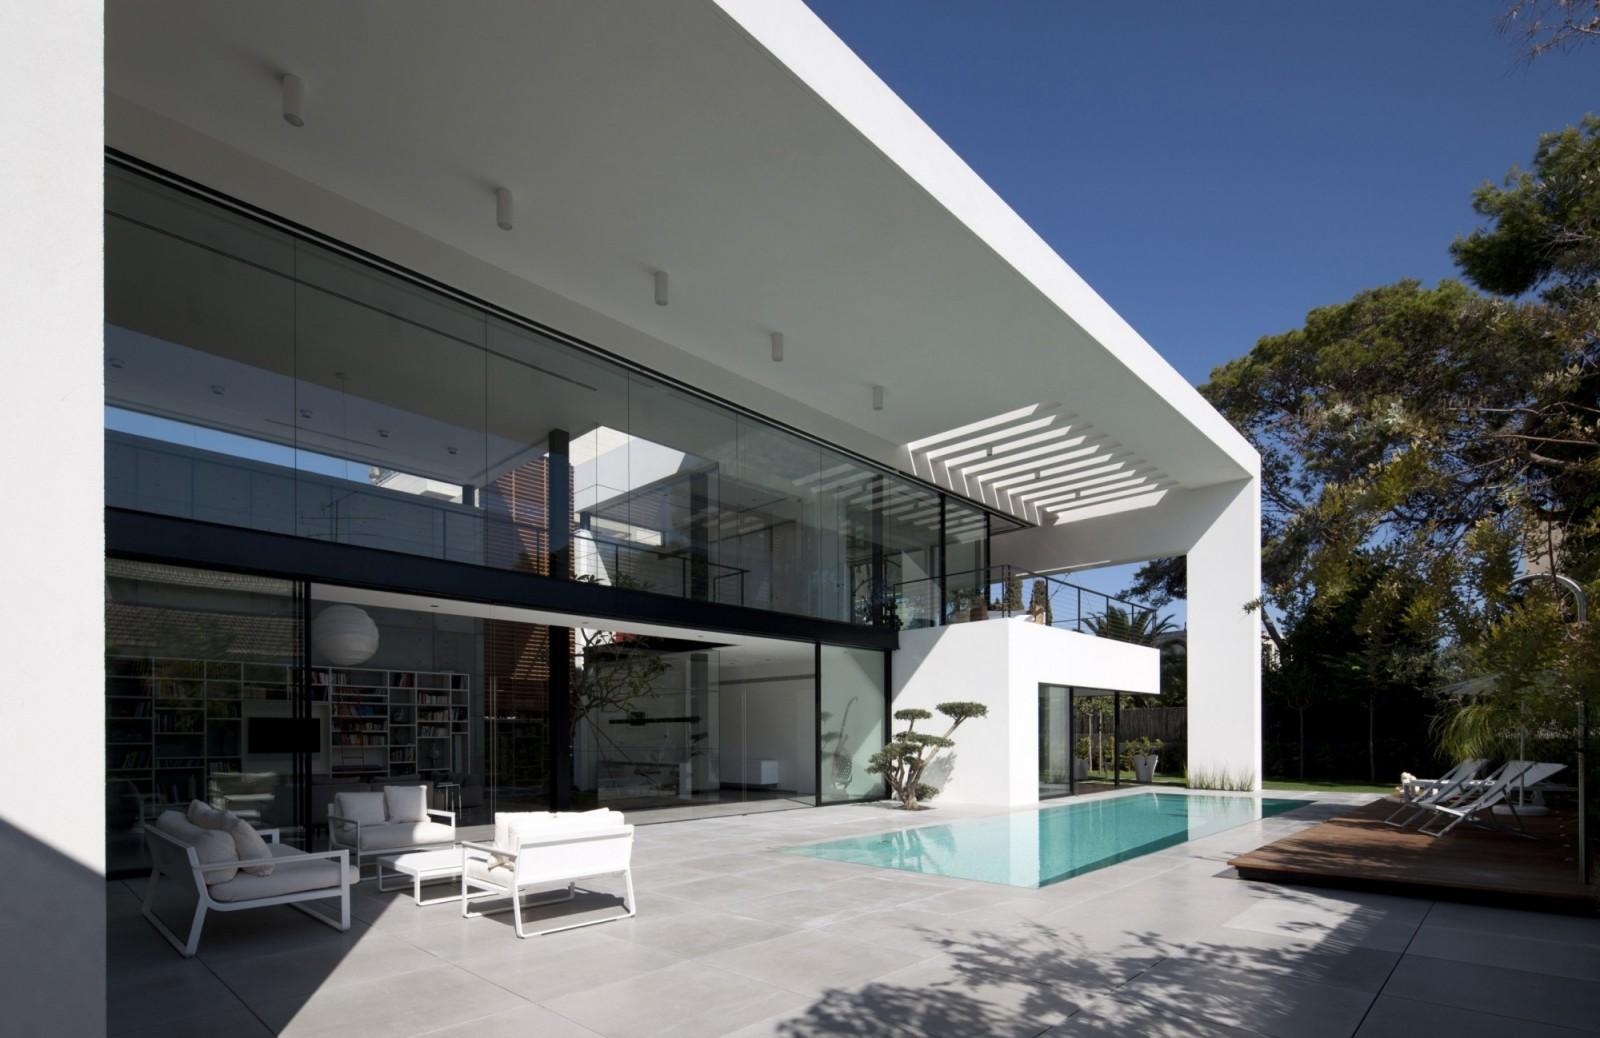 architecte lyon maison moderne avie home. Black Bedroom Furniture Sets. Home Design Ideas